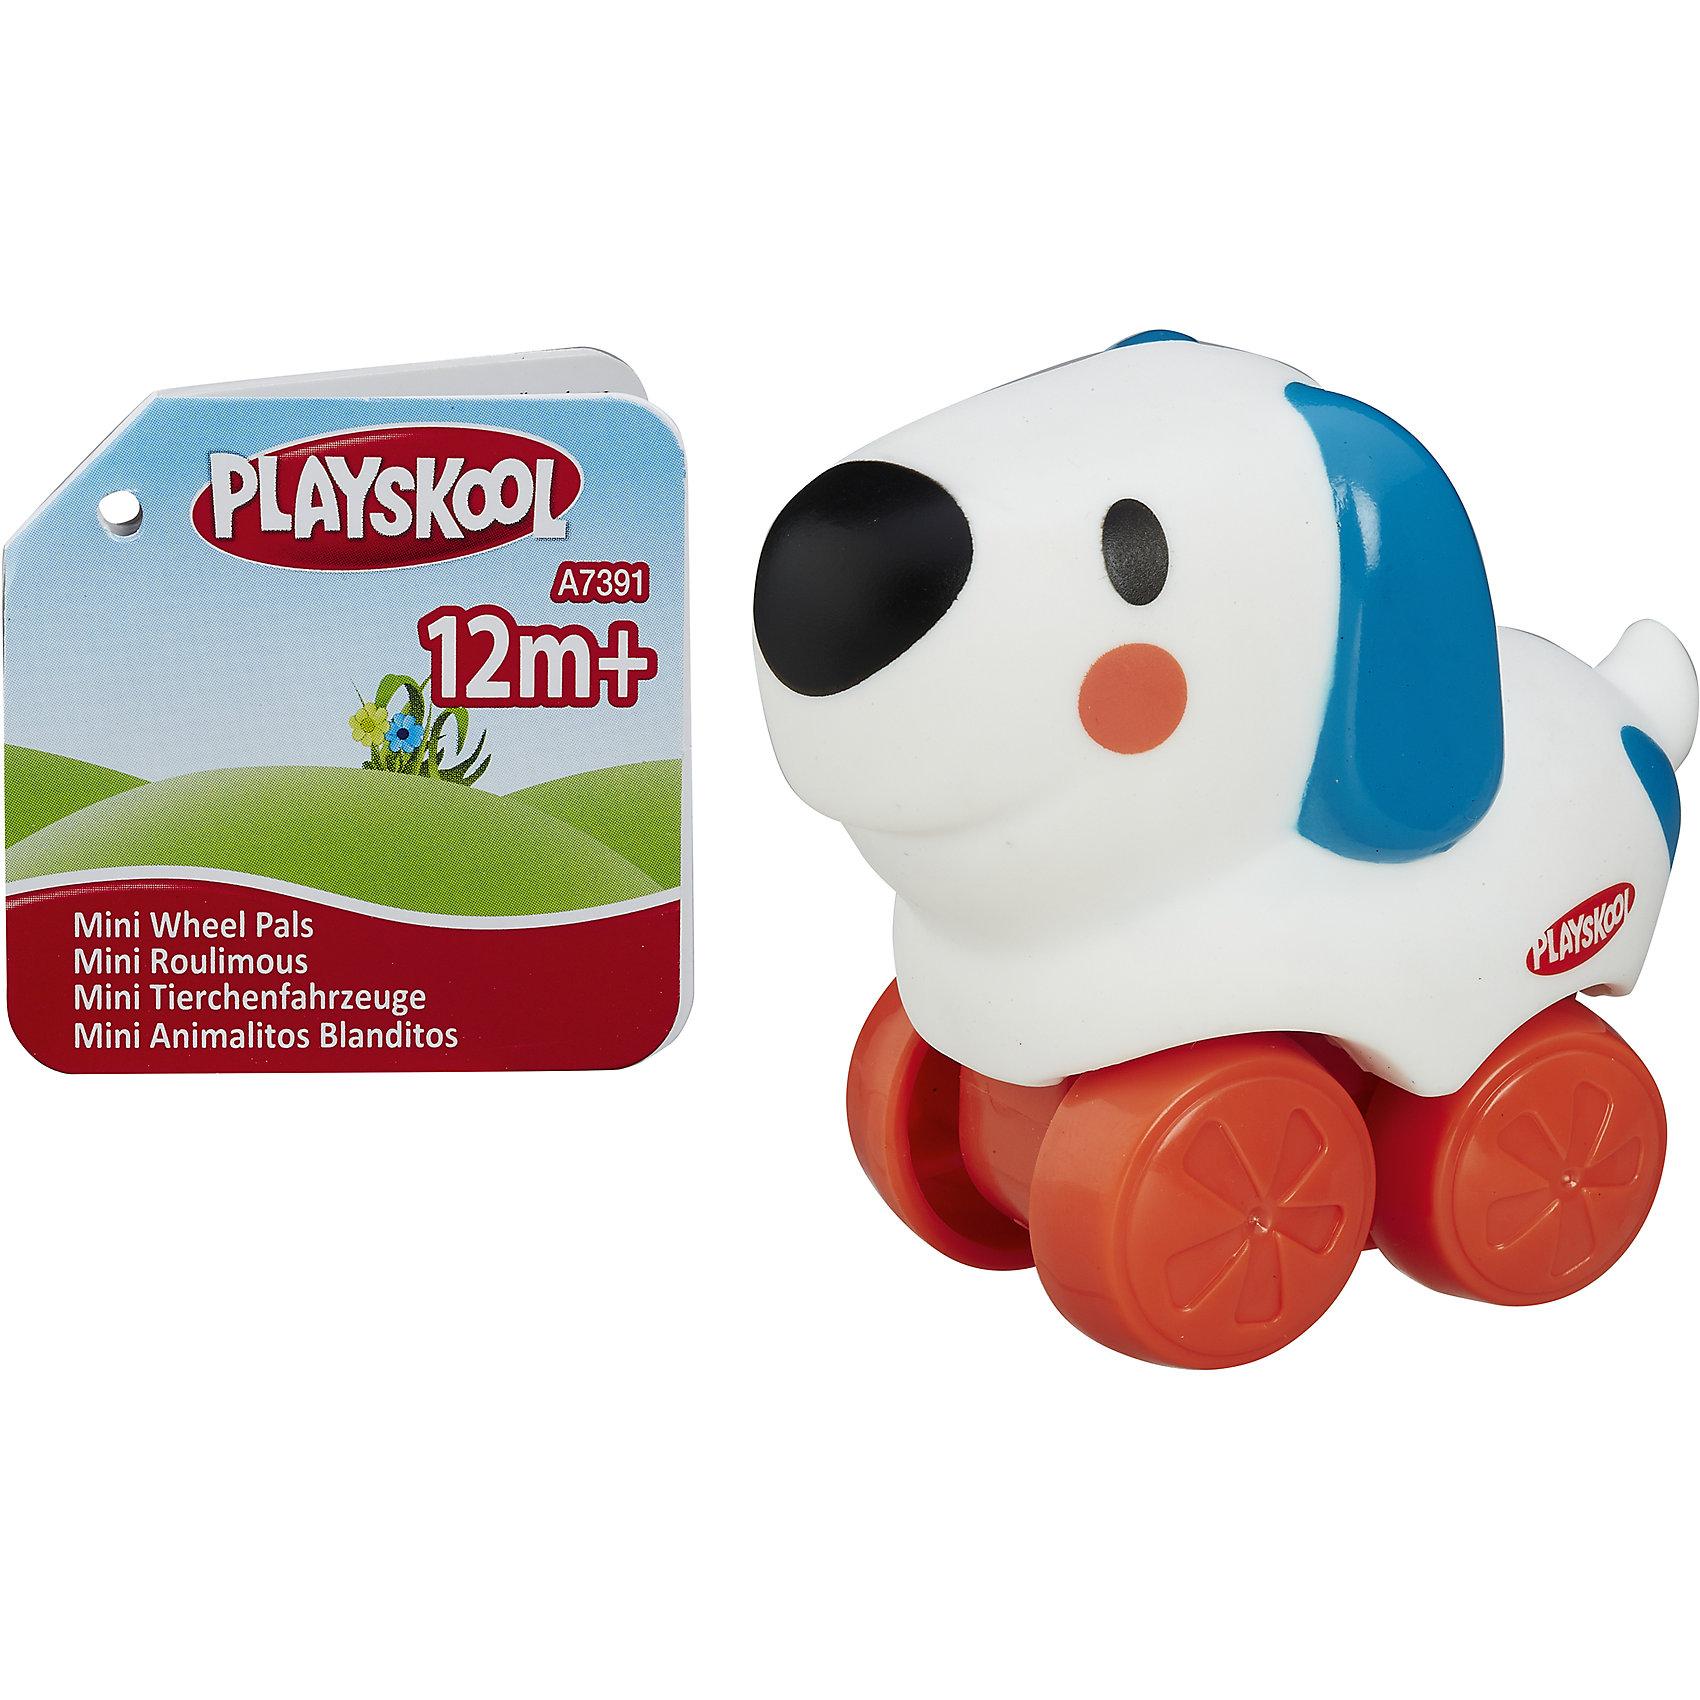 Hasbro Веселые мини-животные Возьми с собой: Собачка, PLAYSKOOL каталки hasbro каталка веселые мини животные